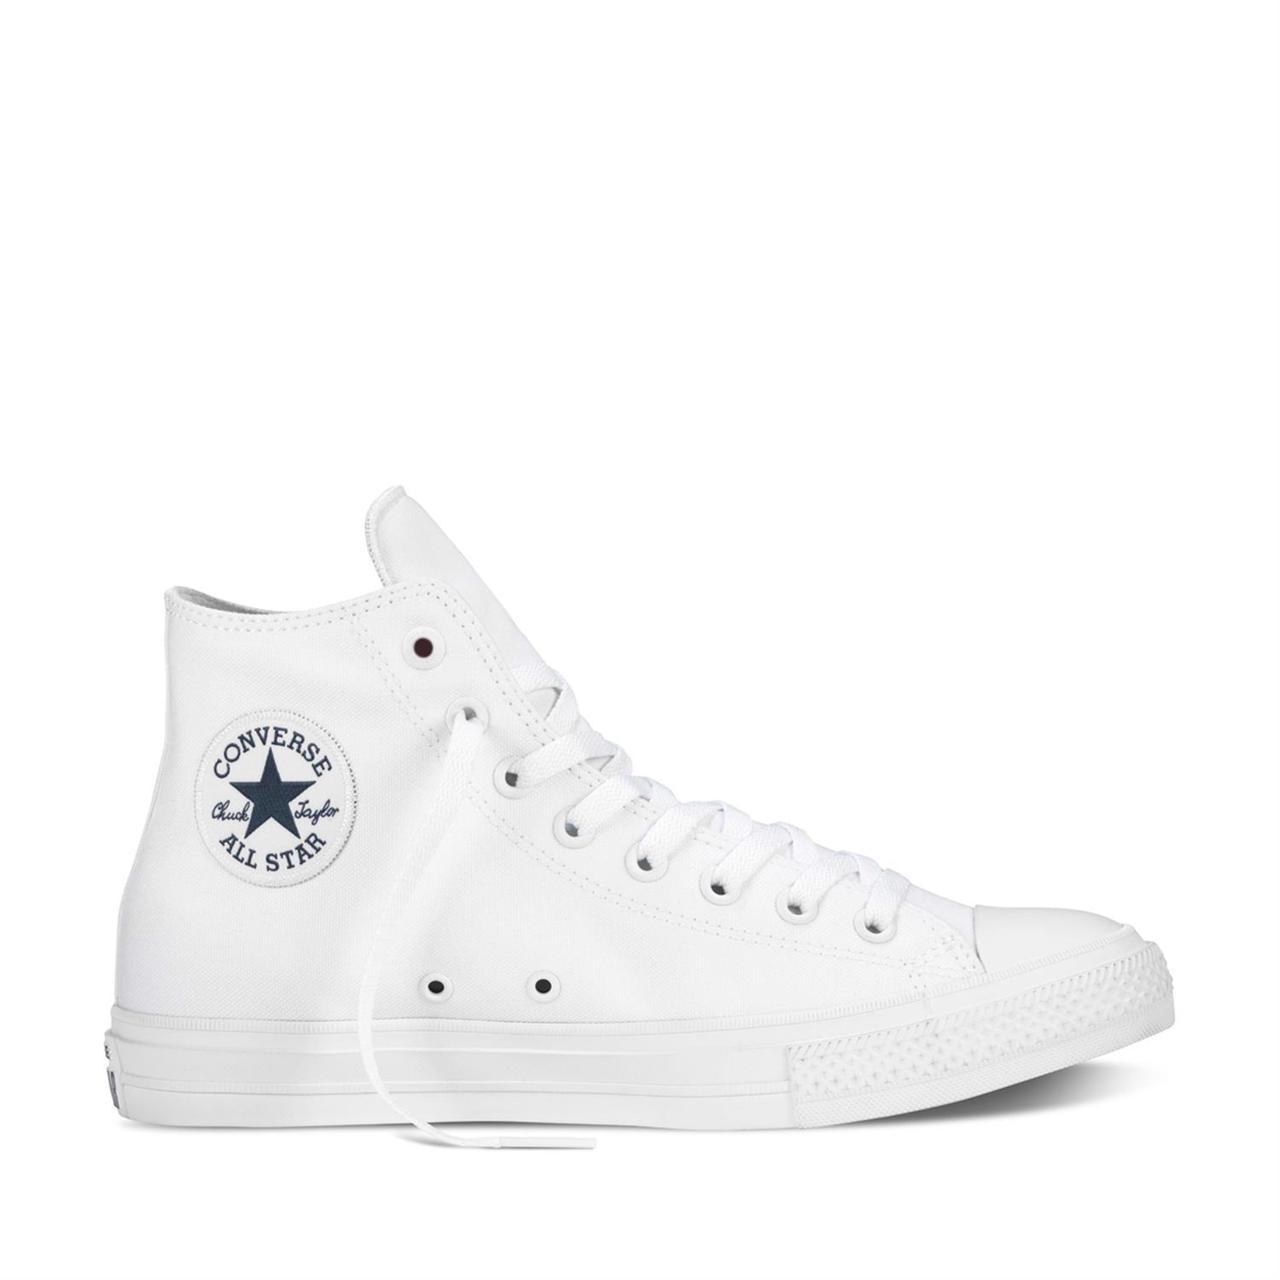 Мужские белые высокие кеды Converse (Конверс) All Star 2 - Интернет магазин  обуви Wikishoes a78bf3f63ac